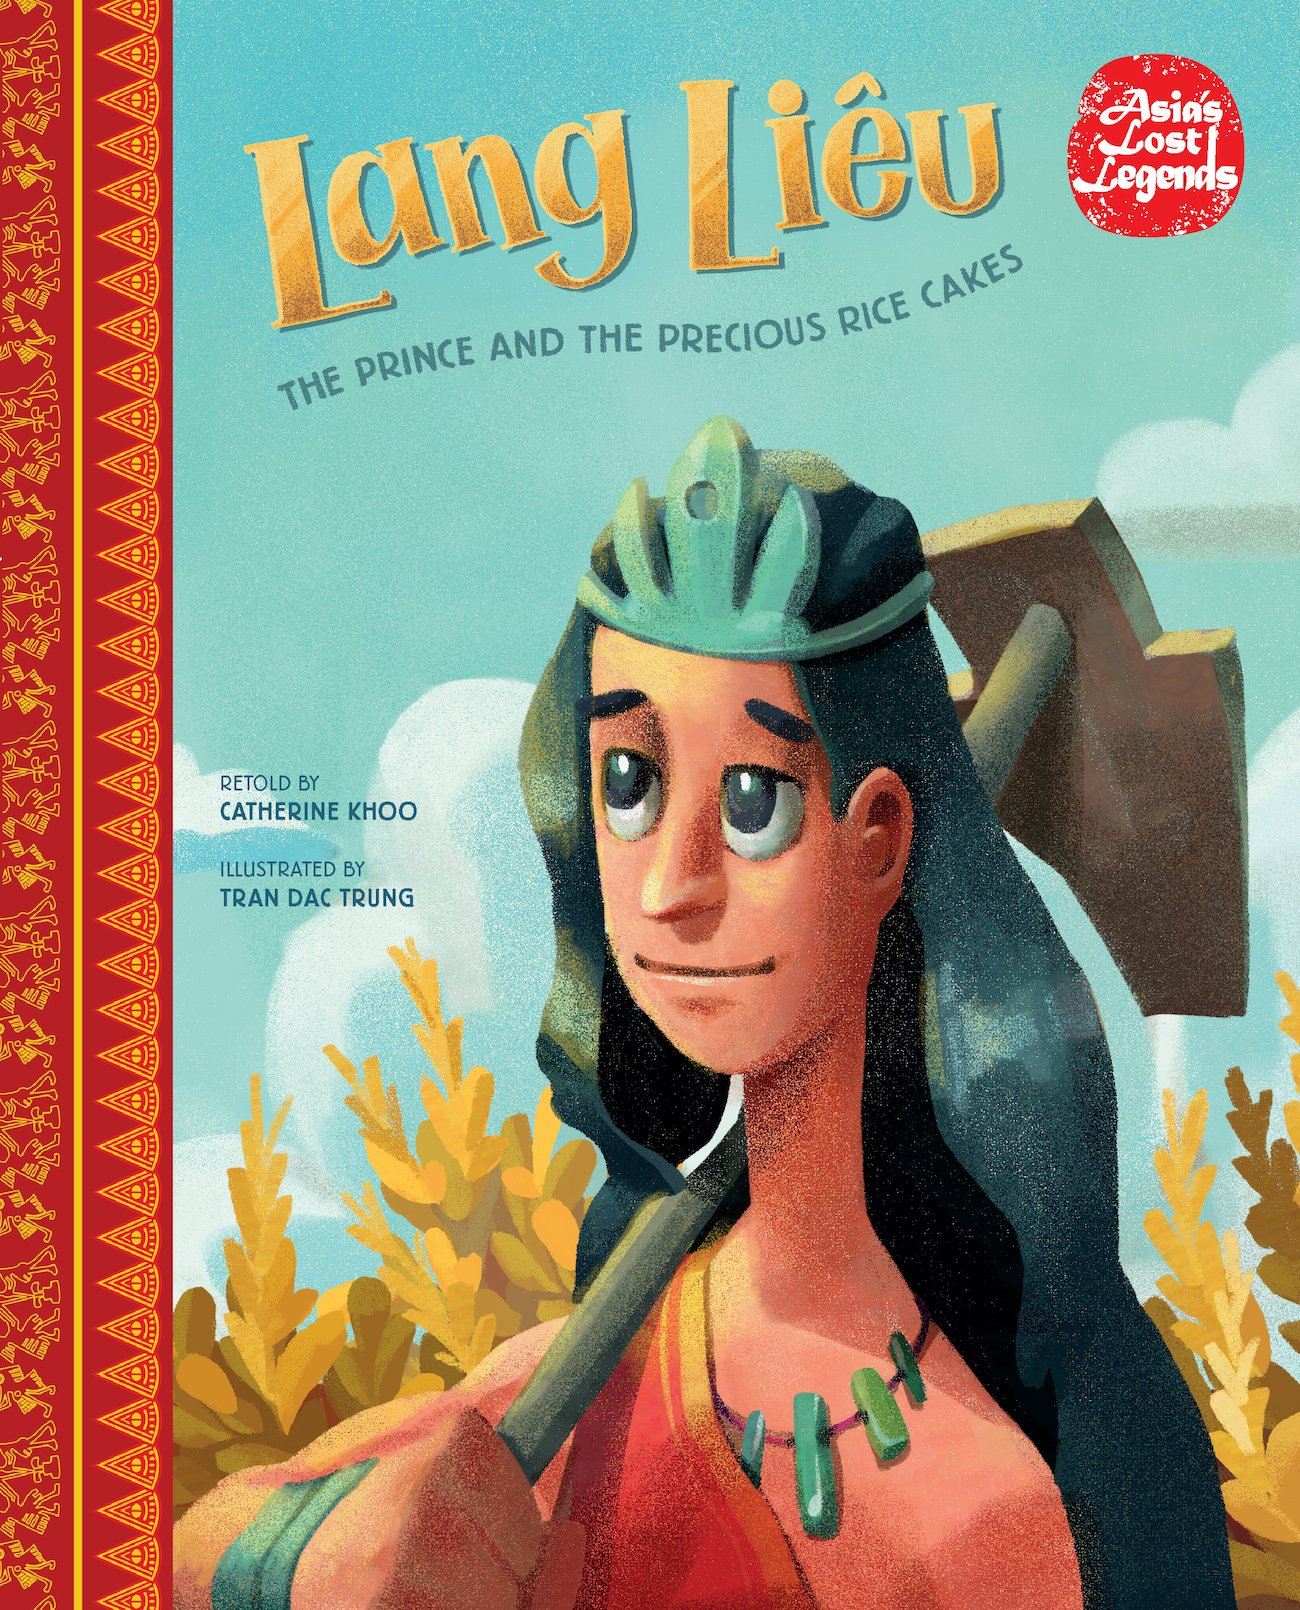 Lang Liéu: The Prince and the Precious Rice Cakes